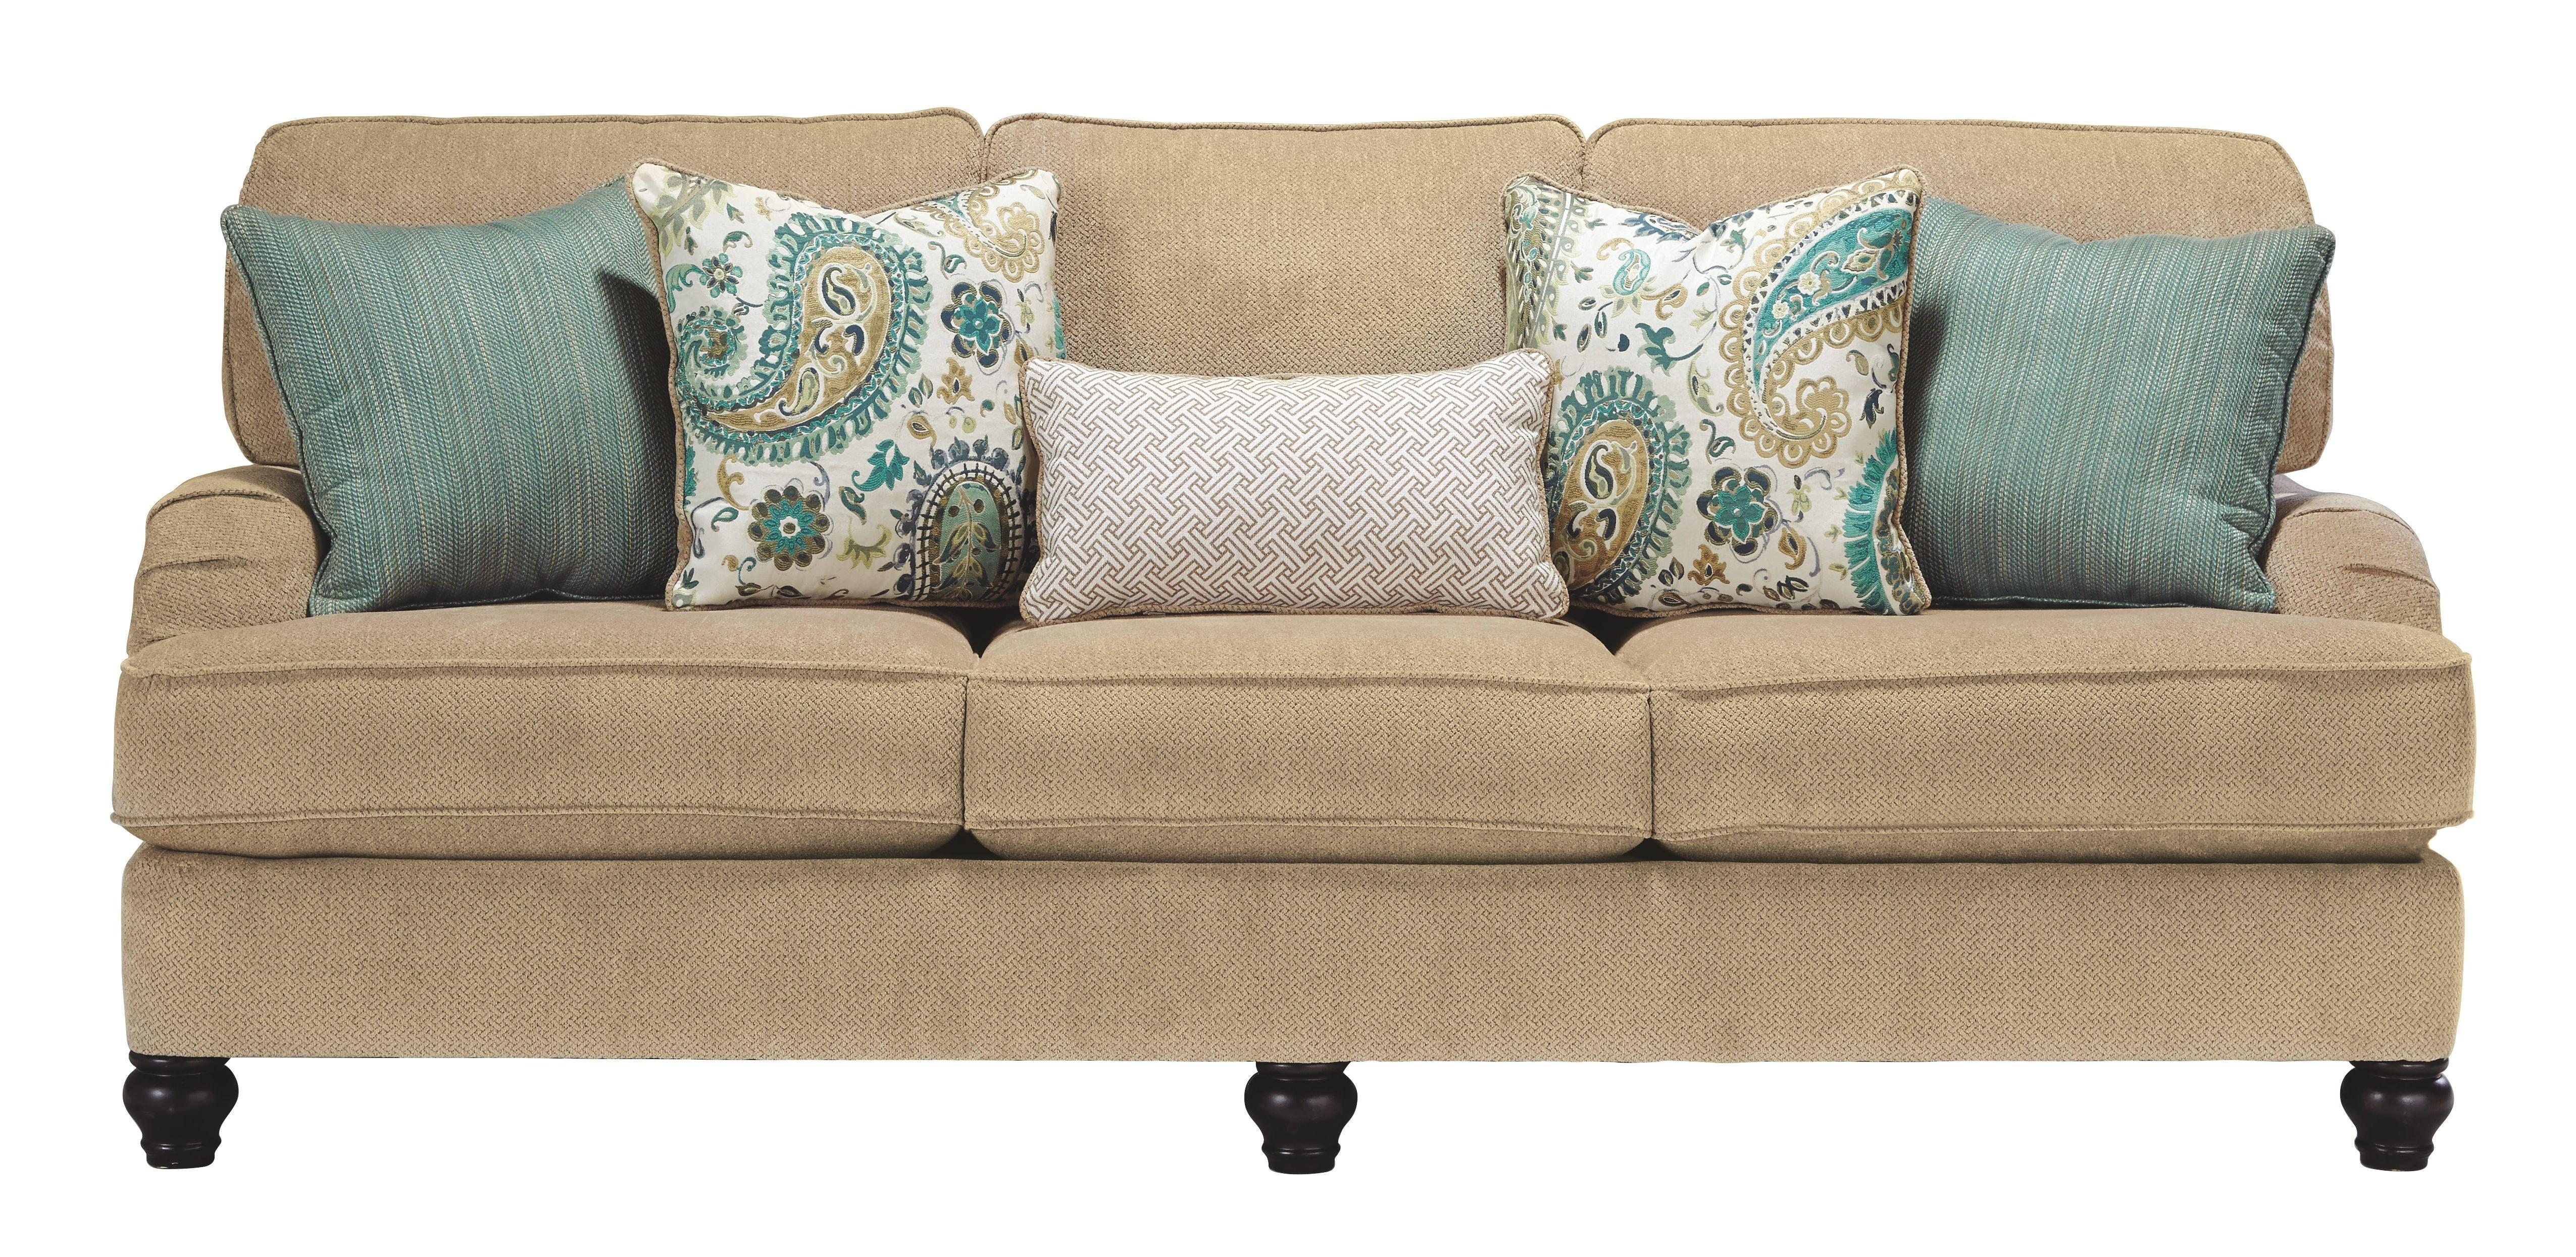 Signature Design by Ashley Living Room Sofa